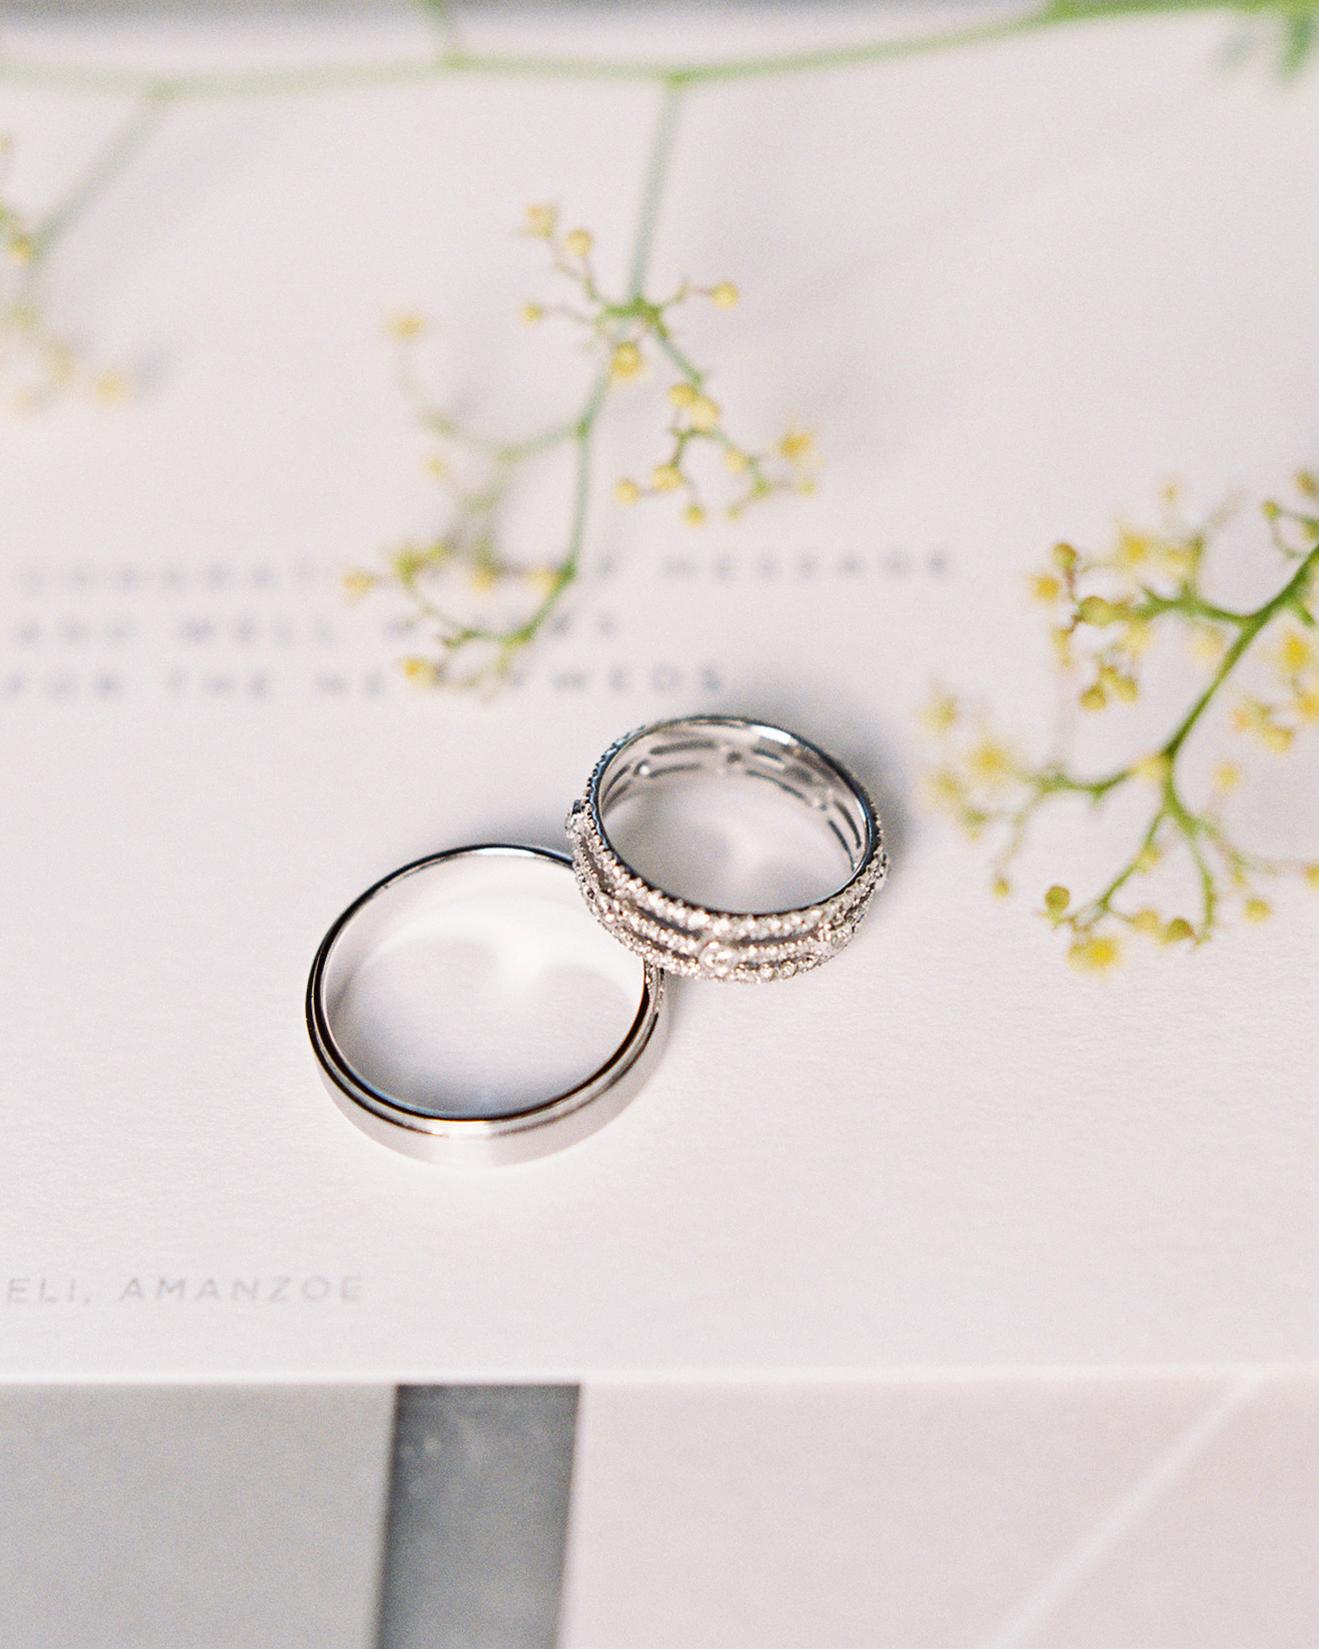 sze amanzoe wedding rings greece elegant